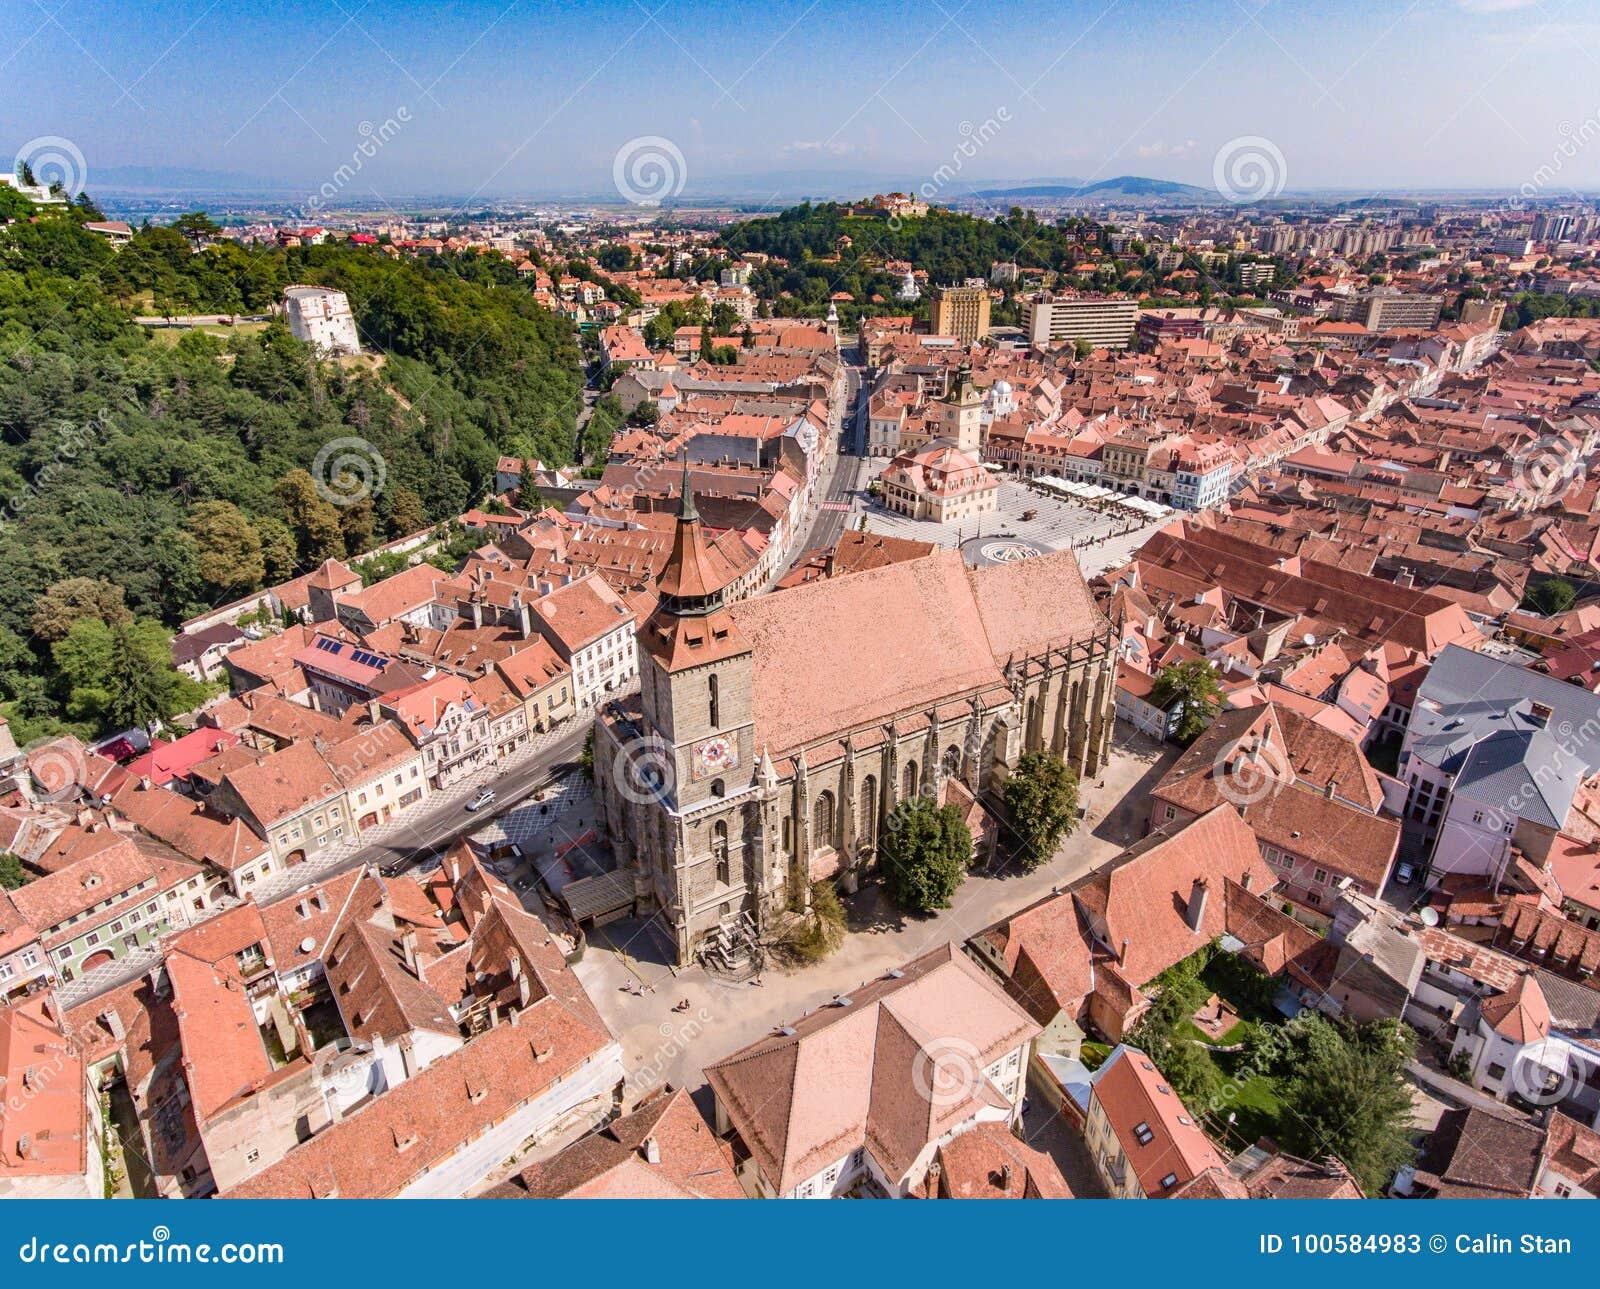 The Black Church in Brasov, Romania, aerial view